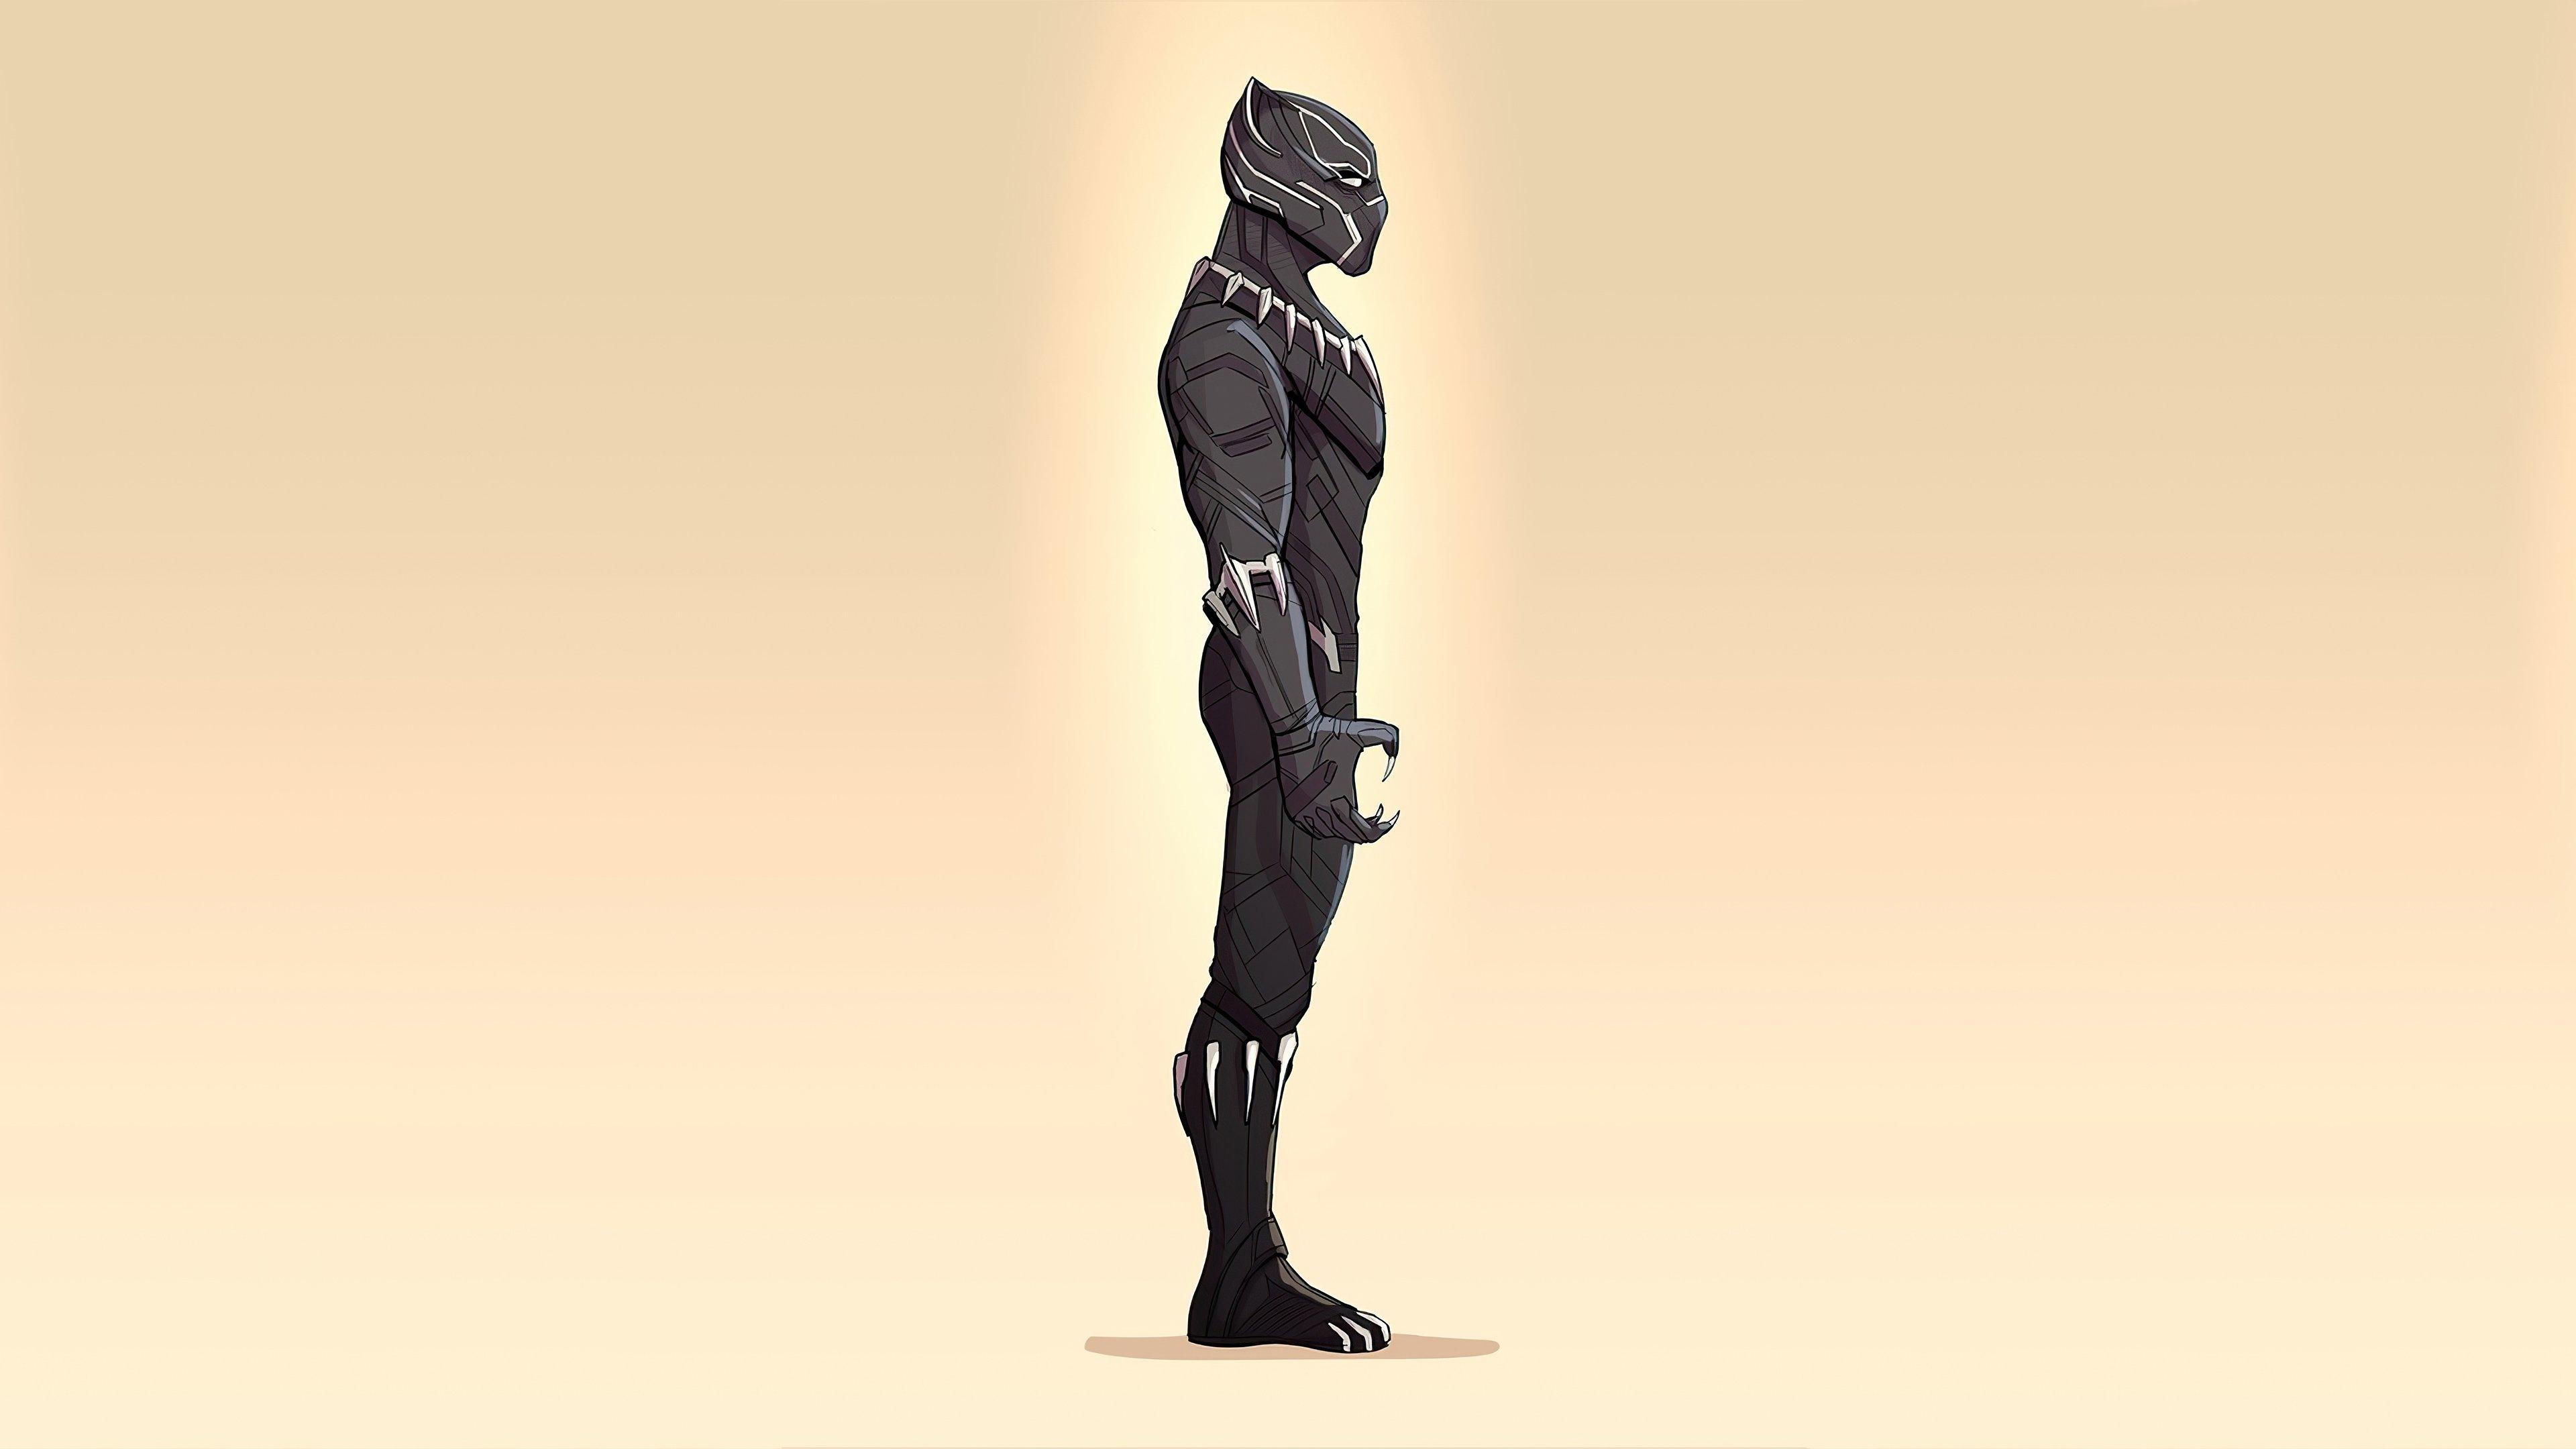 Wallpaper Minimalist Illustration of Black Panther